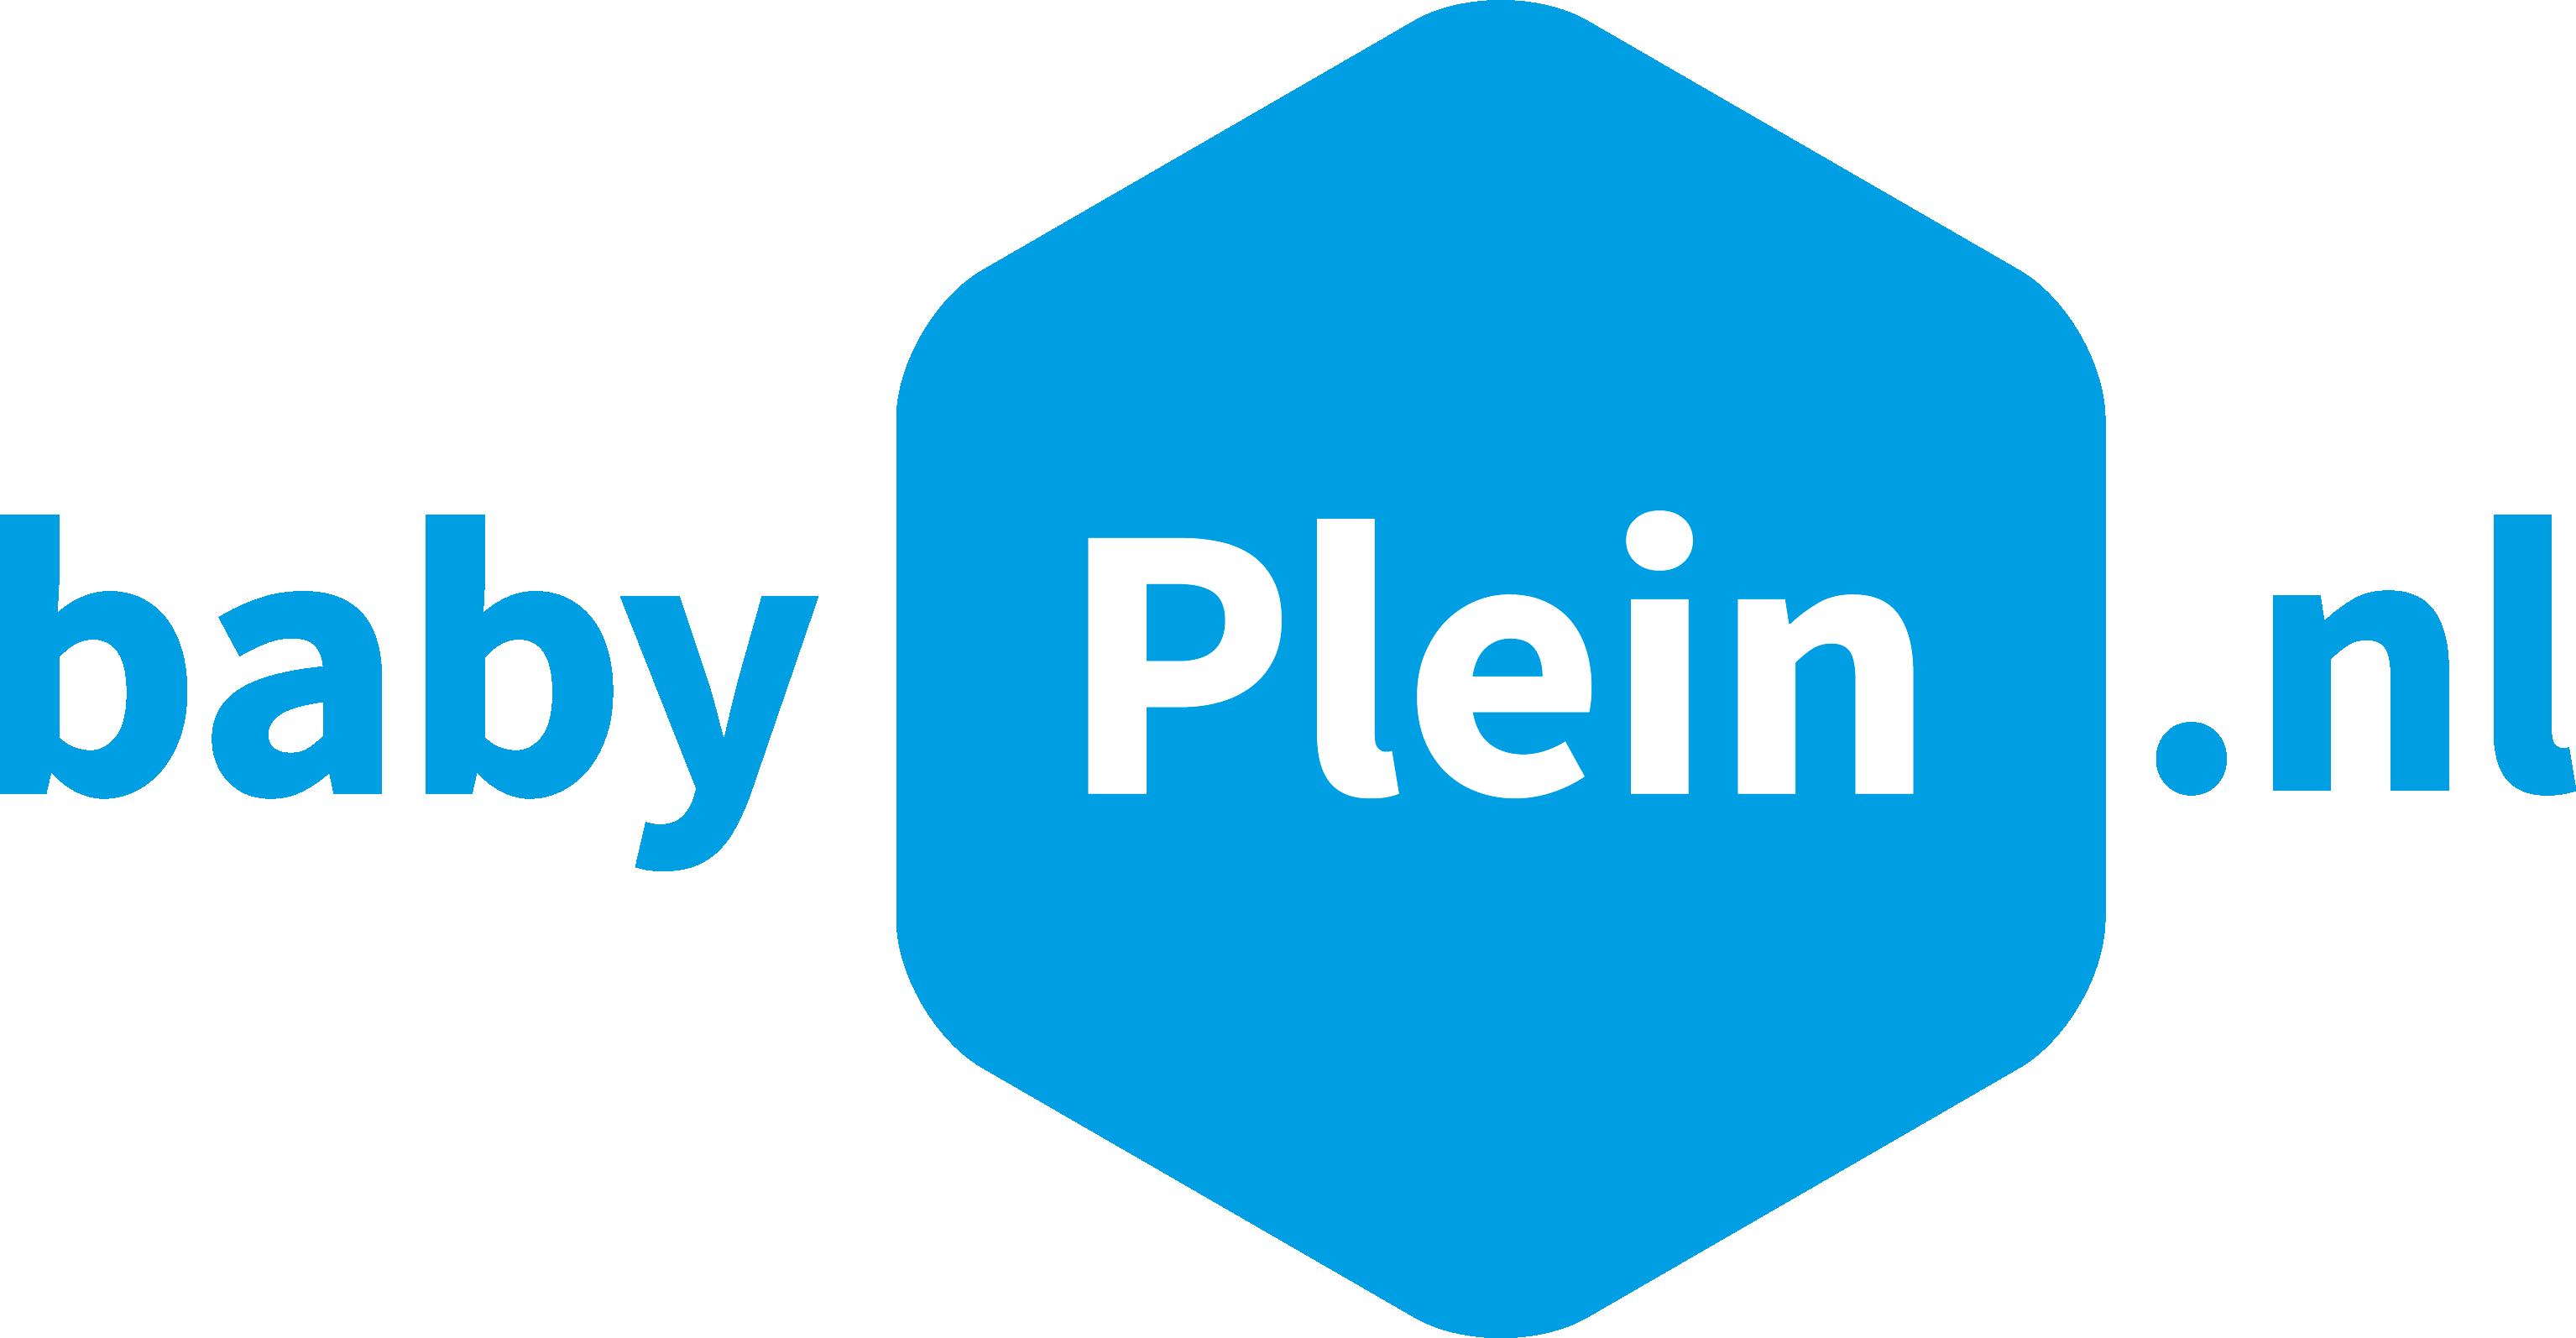 logo babyplein.nl